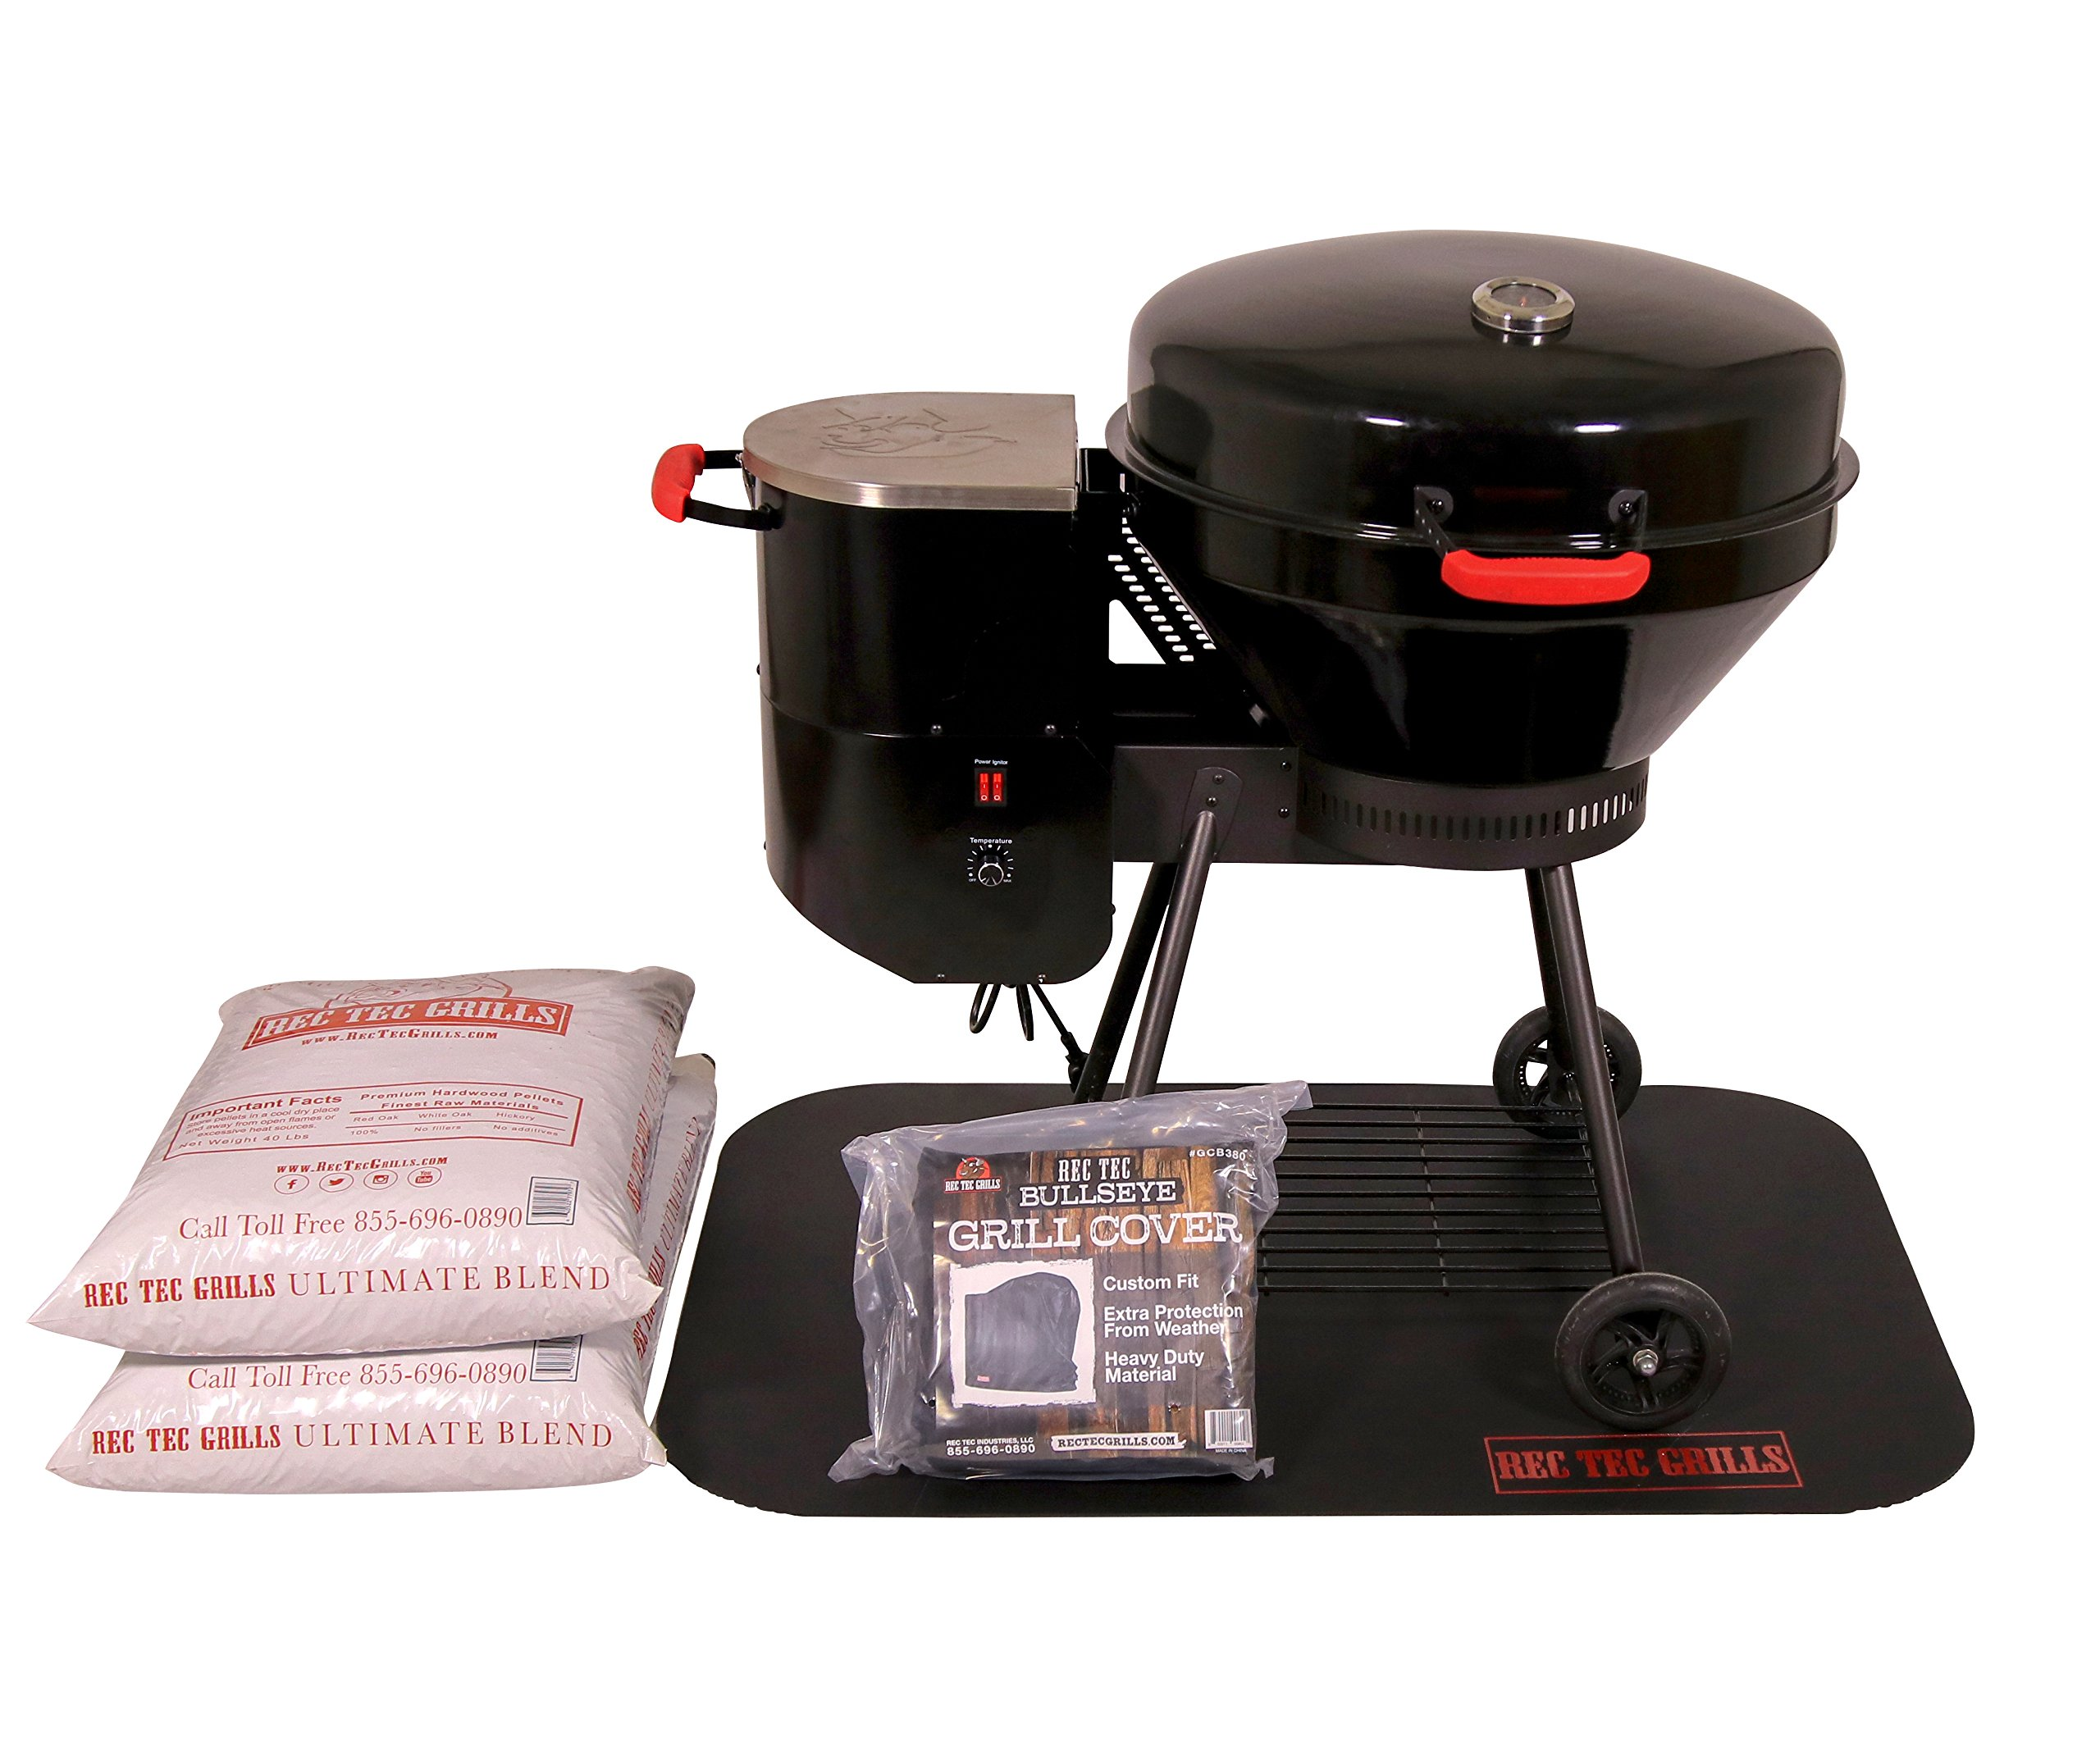 REC TEC Grills Bullseye | RT-B380 | Bundle | Wood Pellet Grill | 15lb Hopper | 2 Year Warranty | Hotflash Ceramic Ignition System